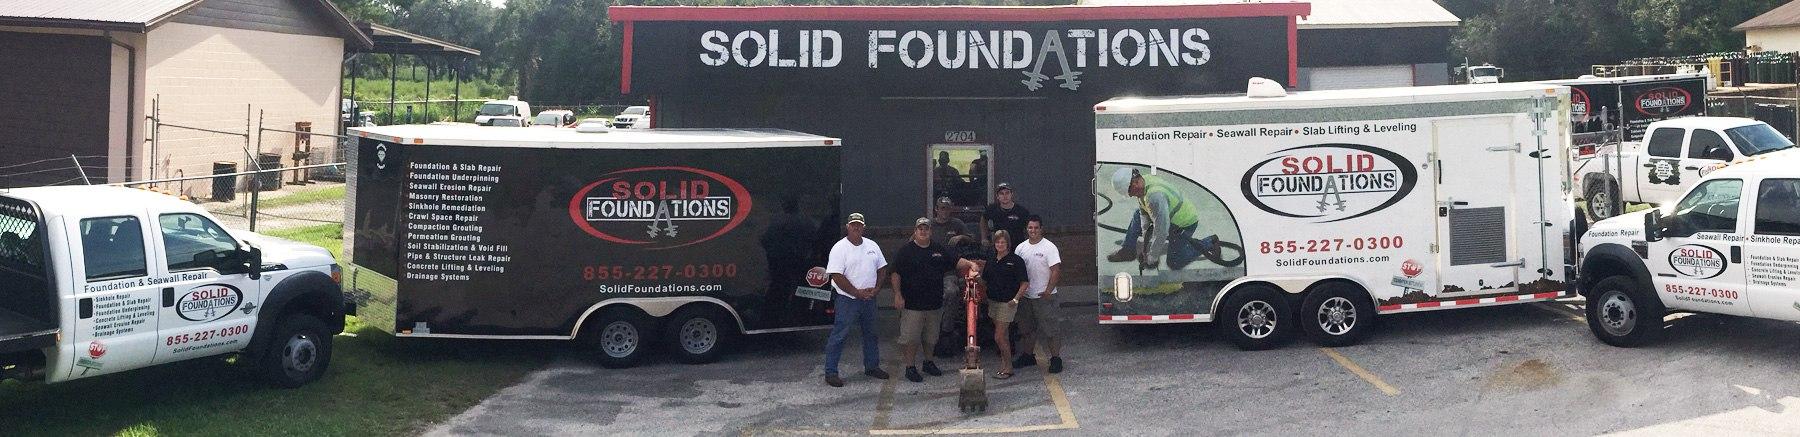 Solid Foundation Team